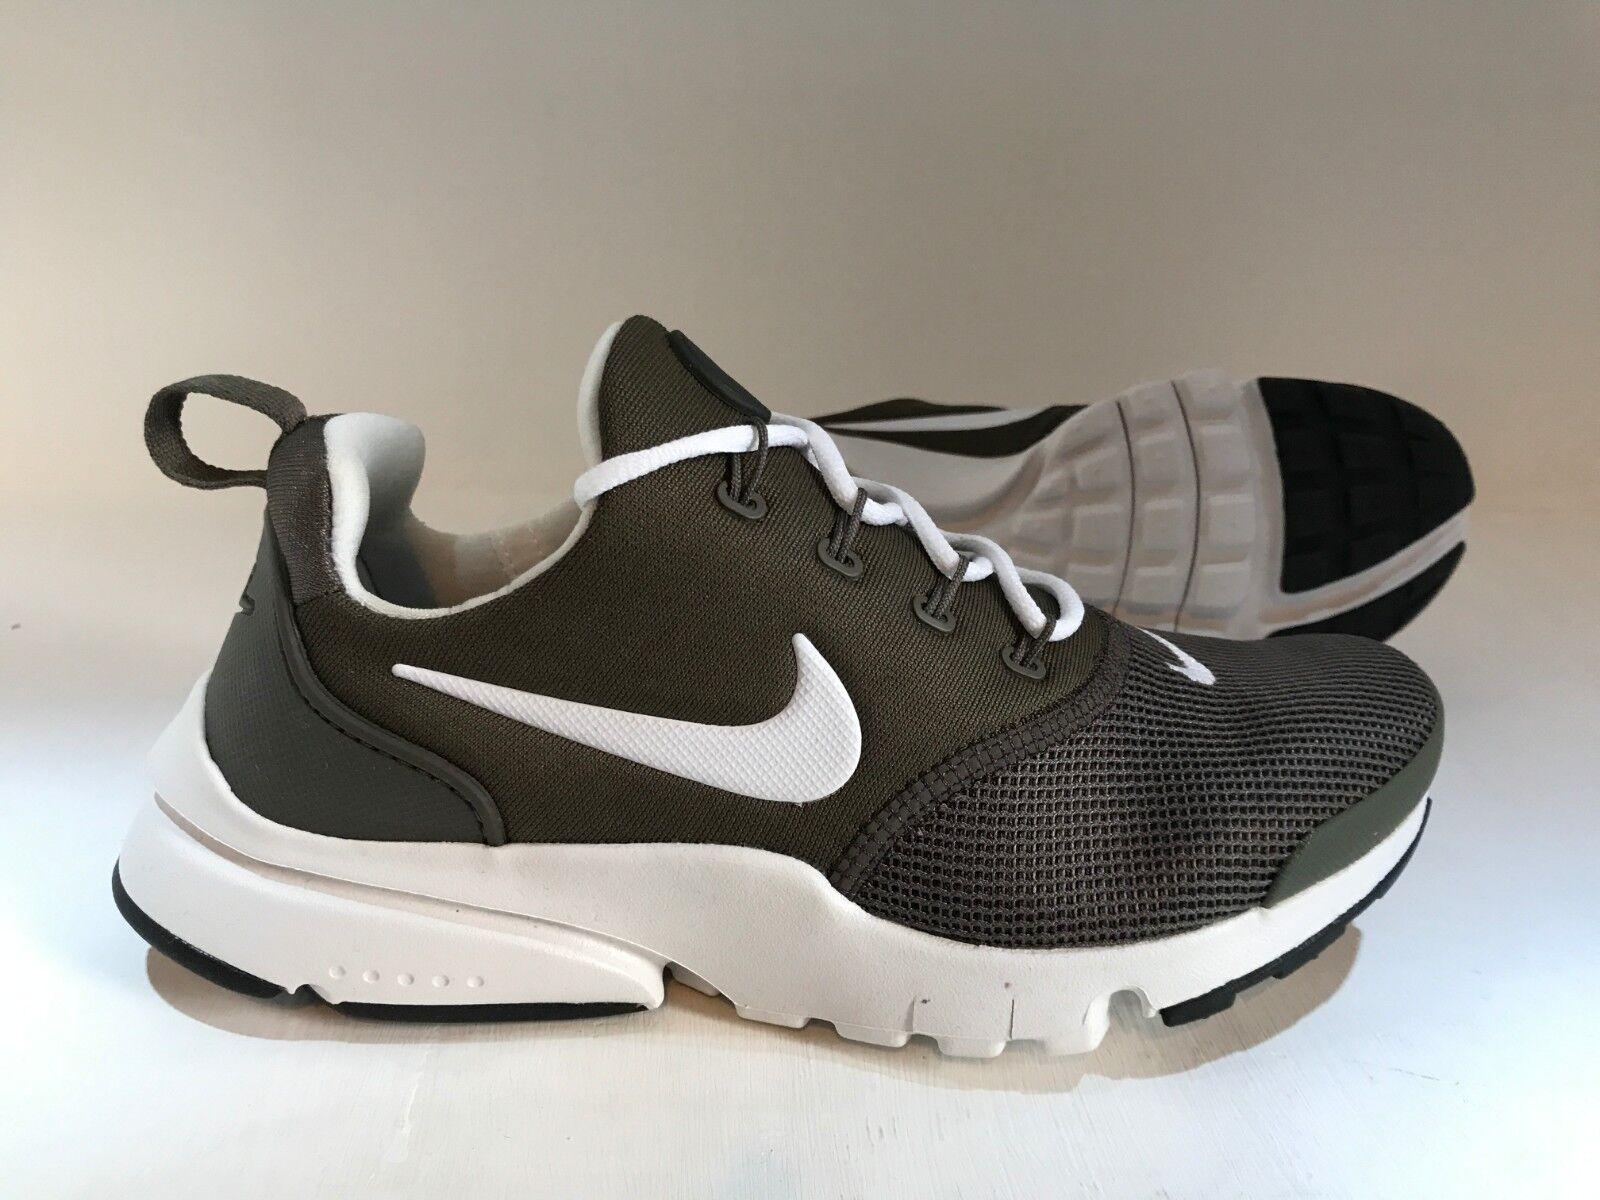 Nike Presto Fly (GS) UK Khaki Grün / Weiß UK (GS) 3.5 US 4Y EUR 36 10f73e